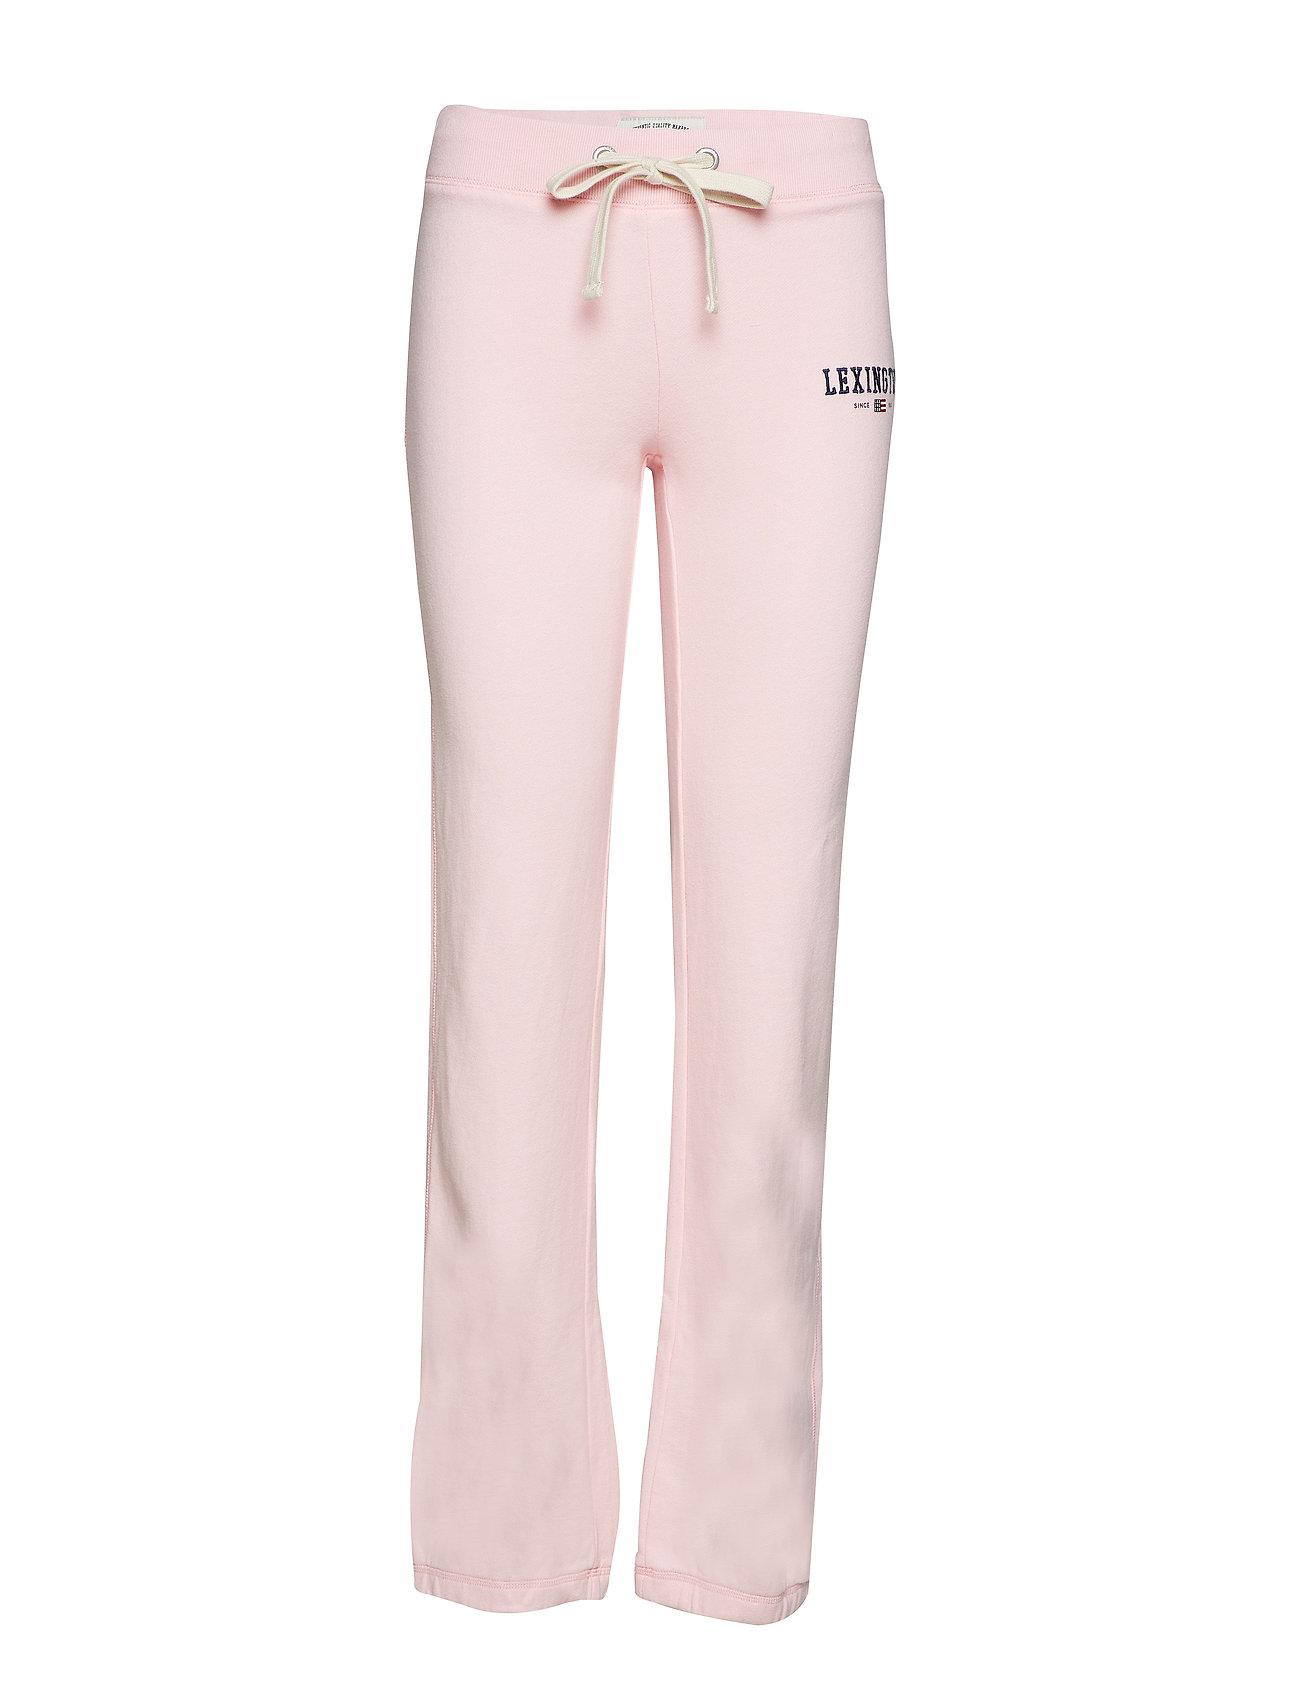 Lexington Clothing Jenna Pants - ROSE SHADOW